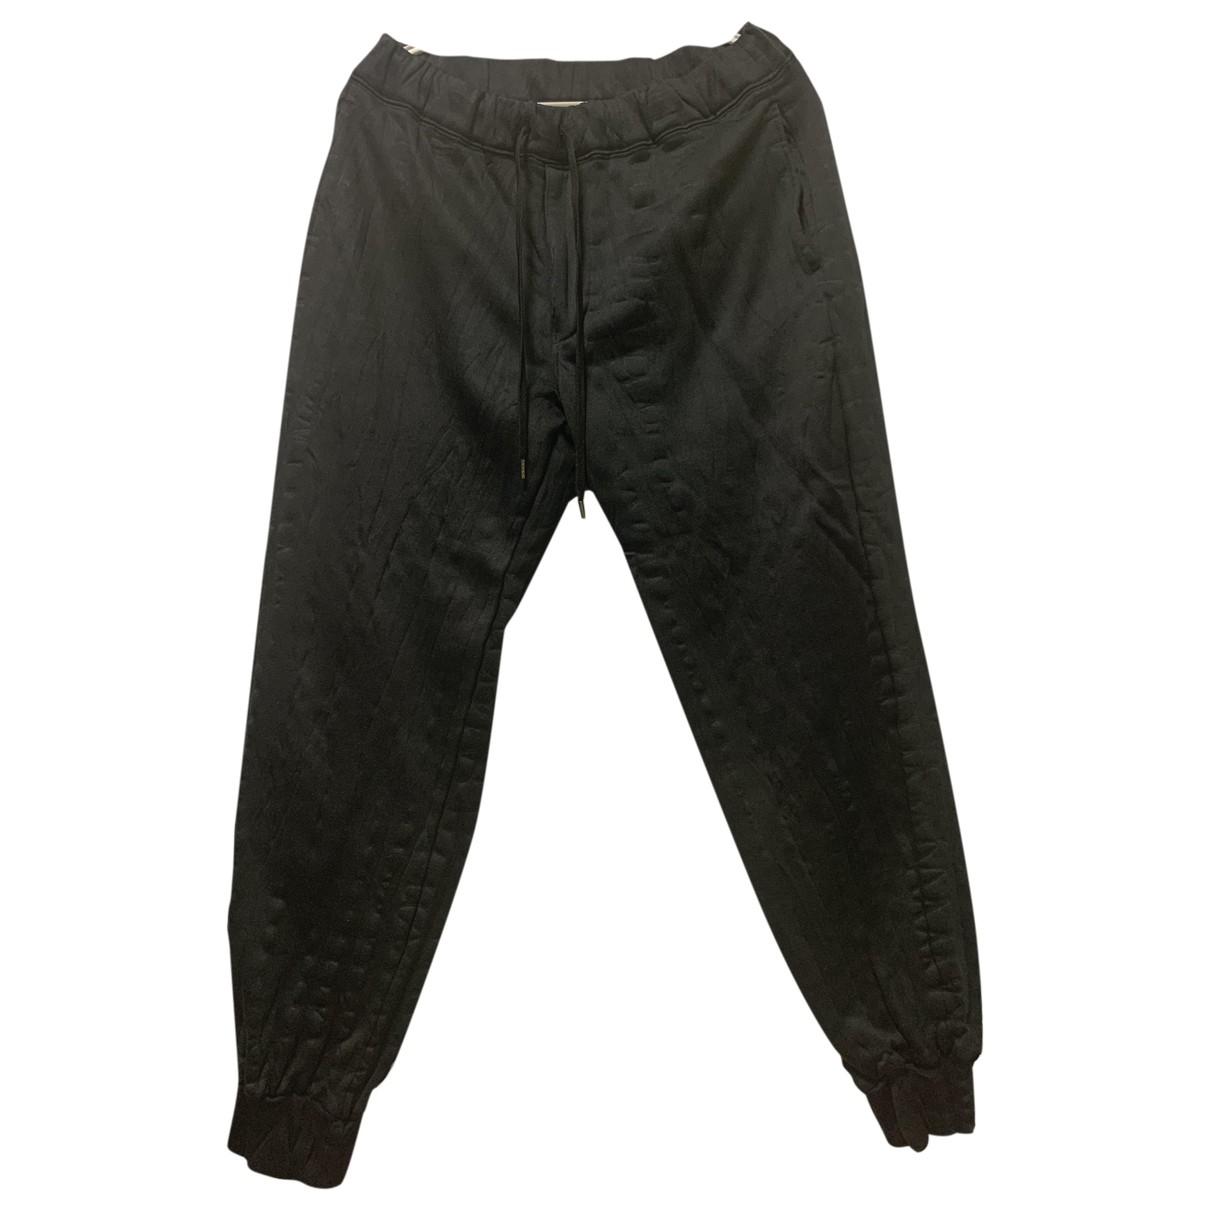 Issey Miyake \N Navy Trousers for Men M International